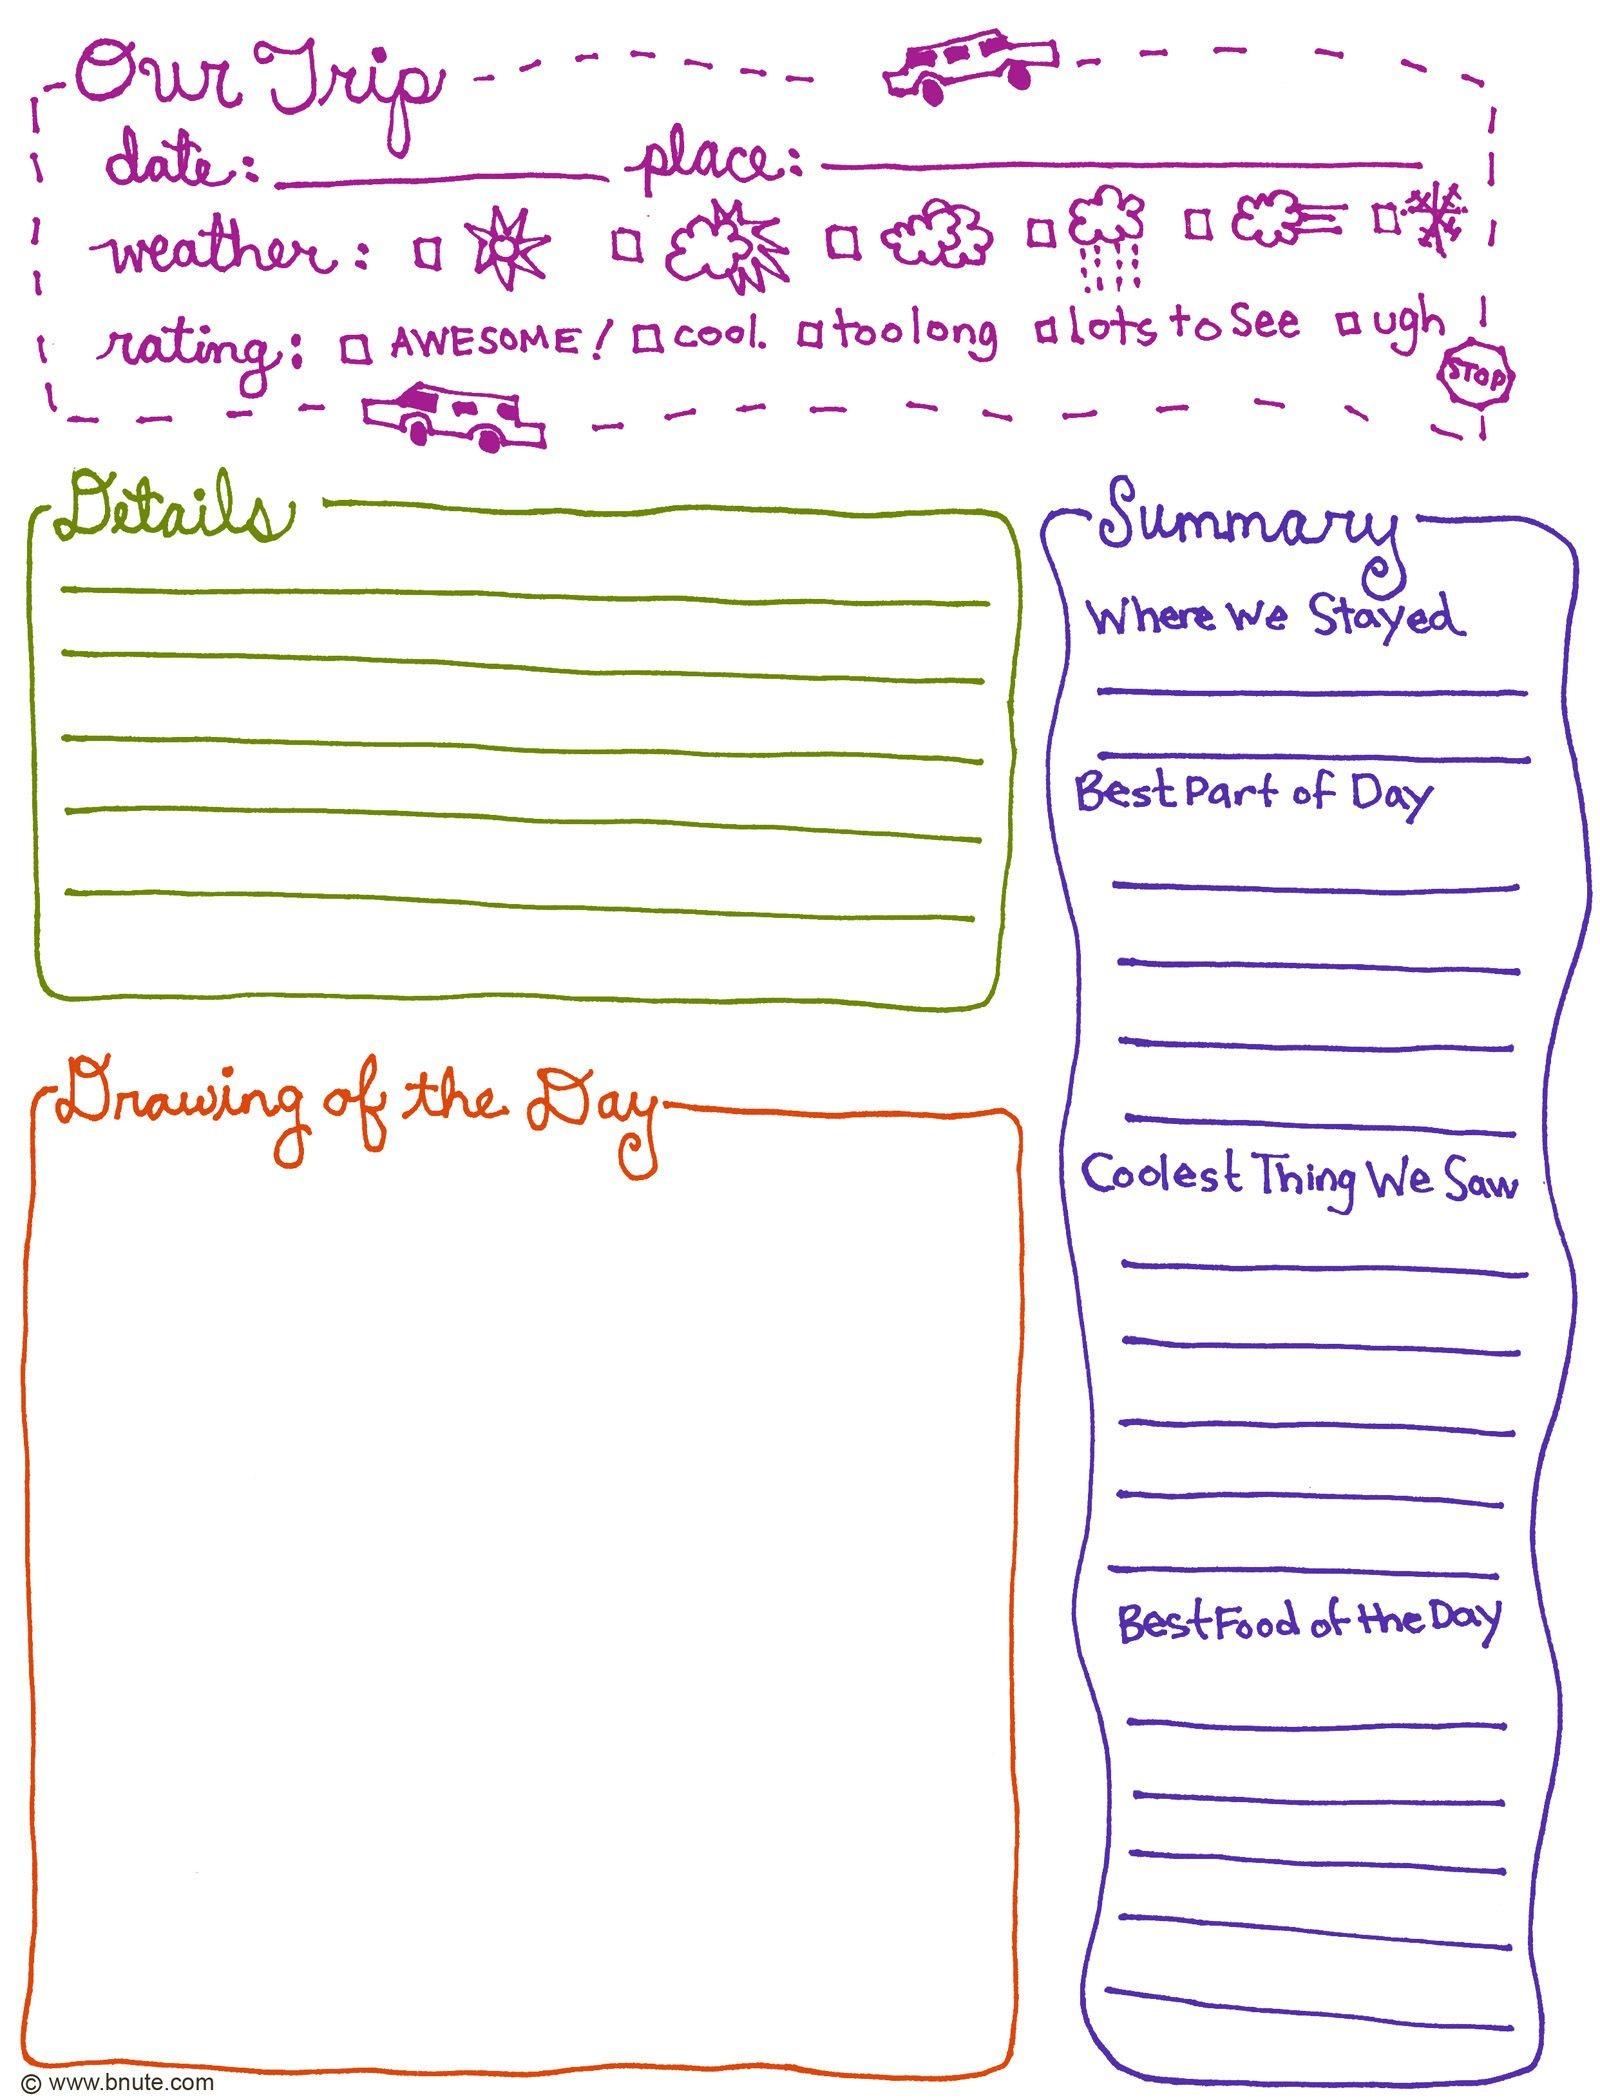 Exclusive Free Printables | Journal Ideas | Kids Travel Journal - Free Printable Walking Log